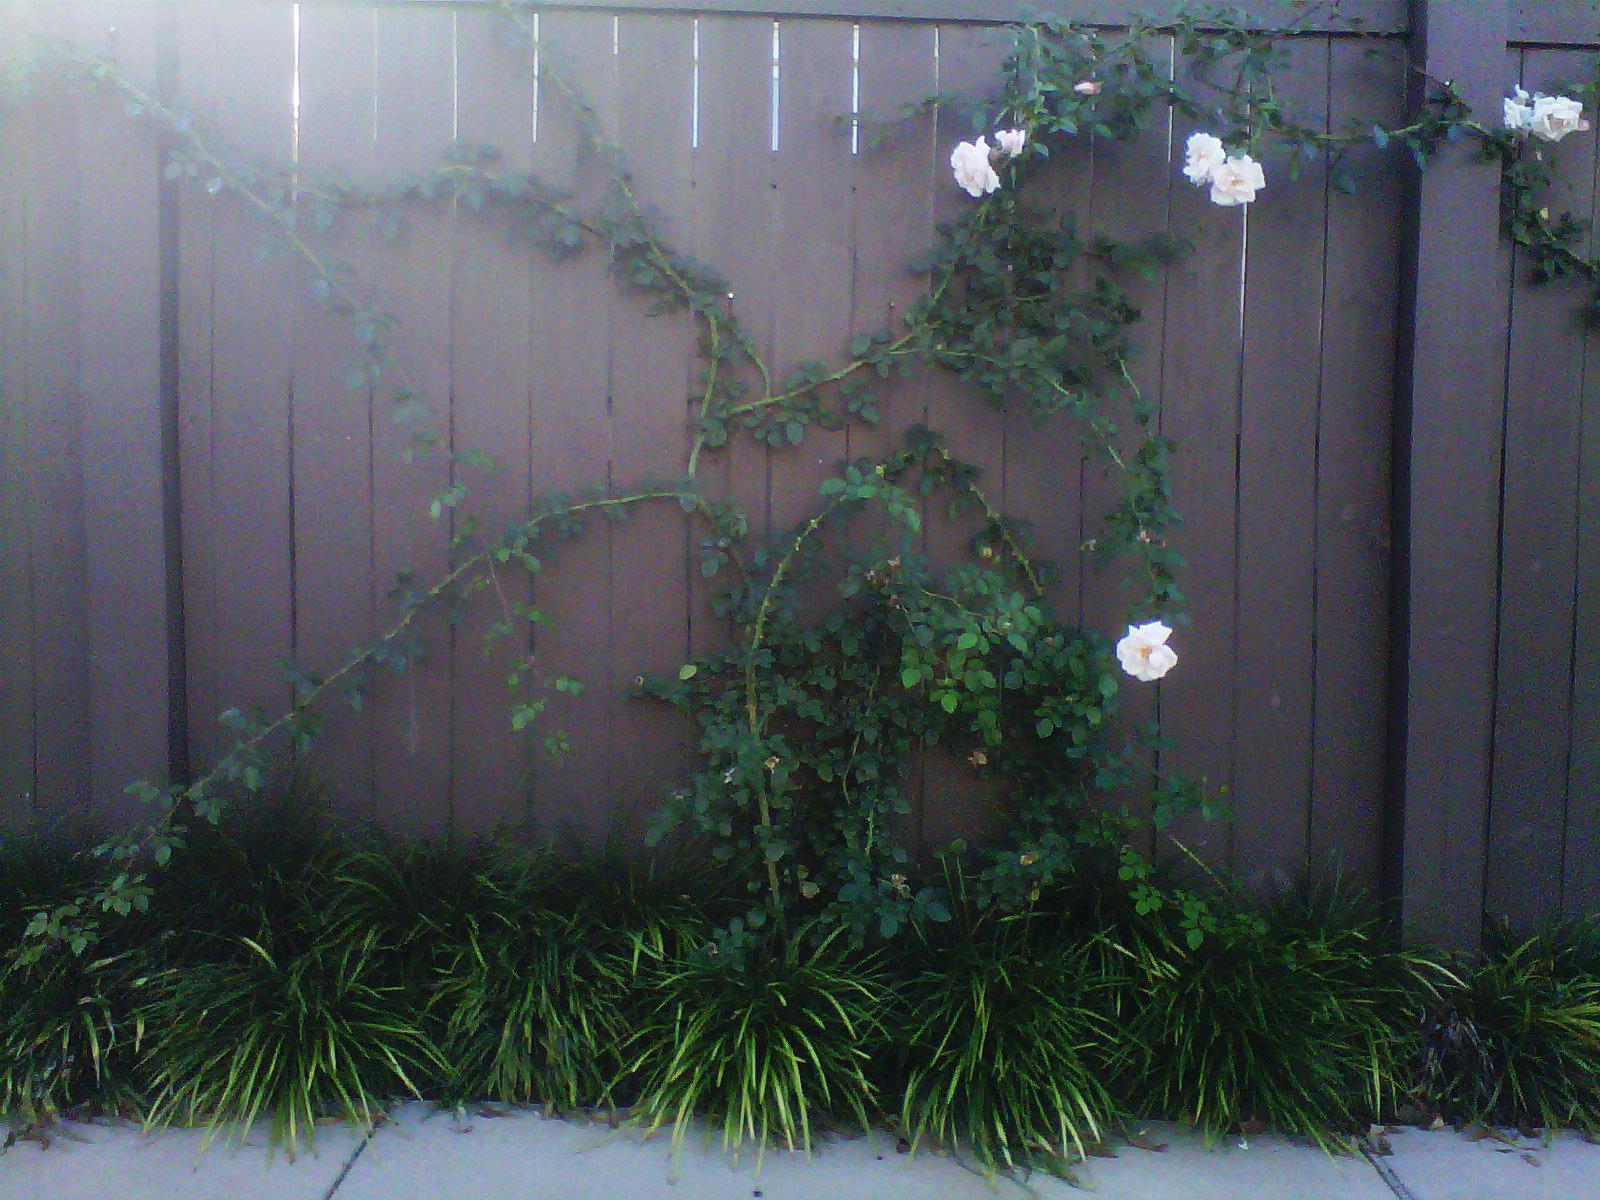 Justin Stelter Landscape Gardening - Modern Suburban Landscaping - 12591732943_44aa50f80a_o.jpg